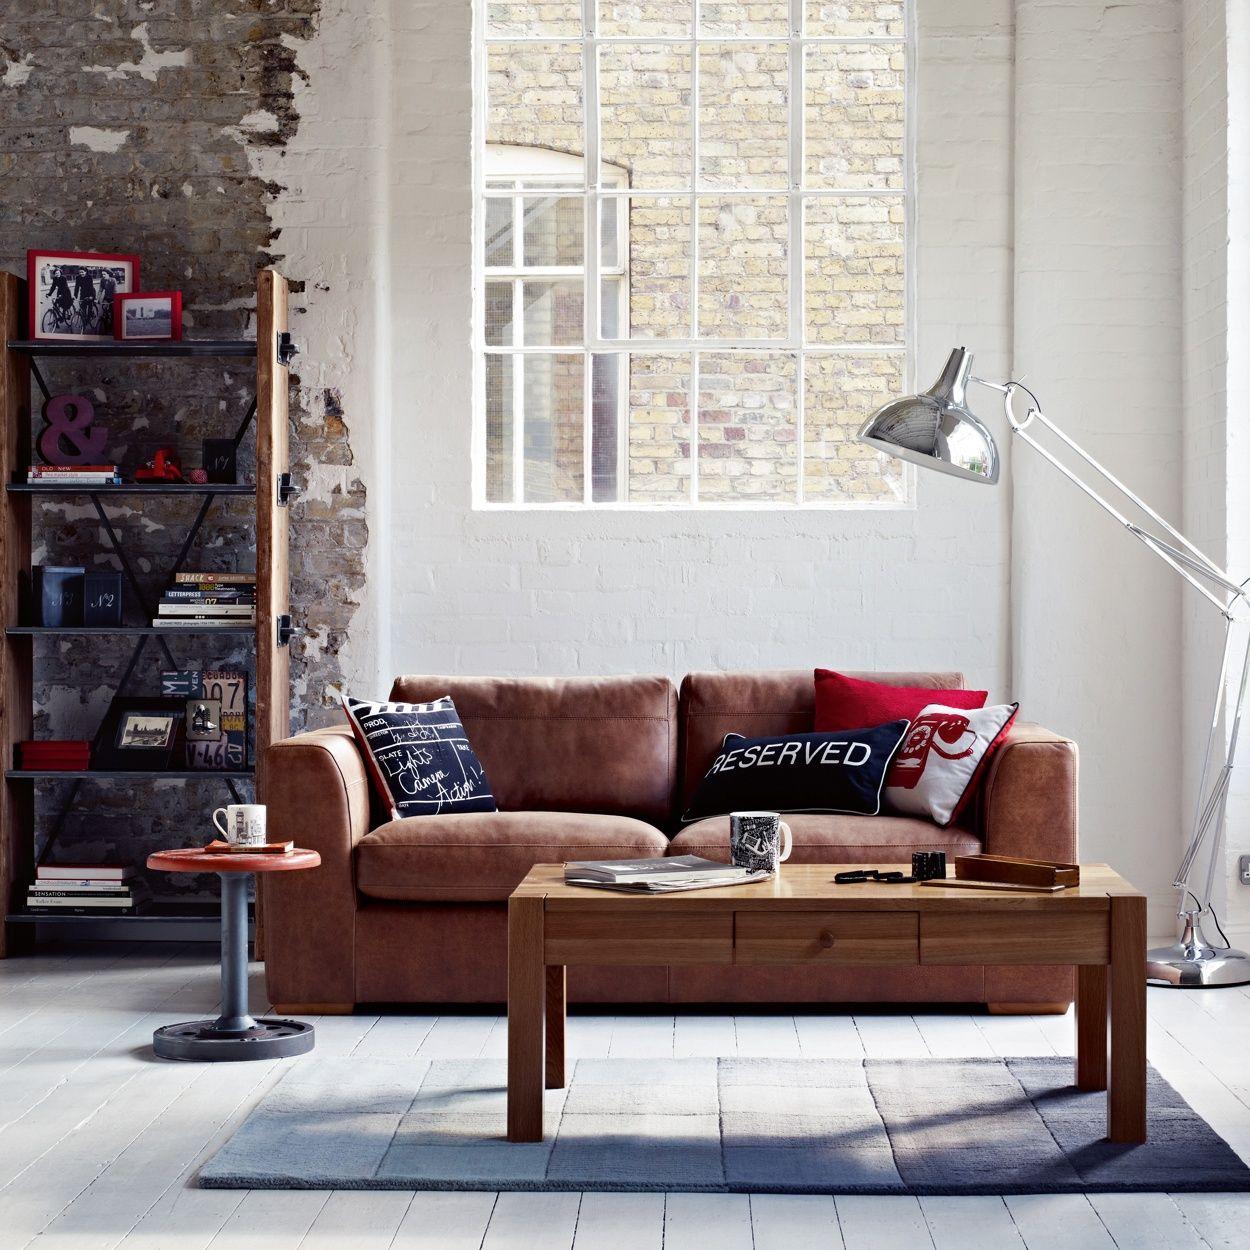 Debenhams Tan Leather Paris Large Sofa At Debenhams within dimensions 1250 X 1250